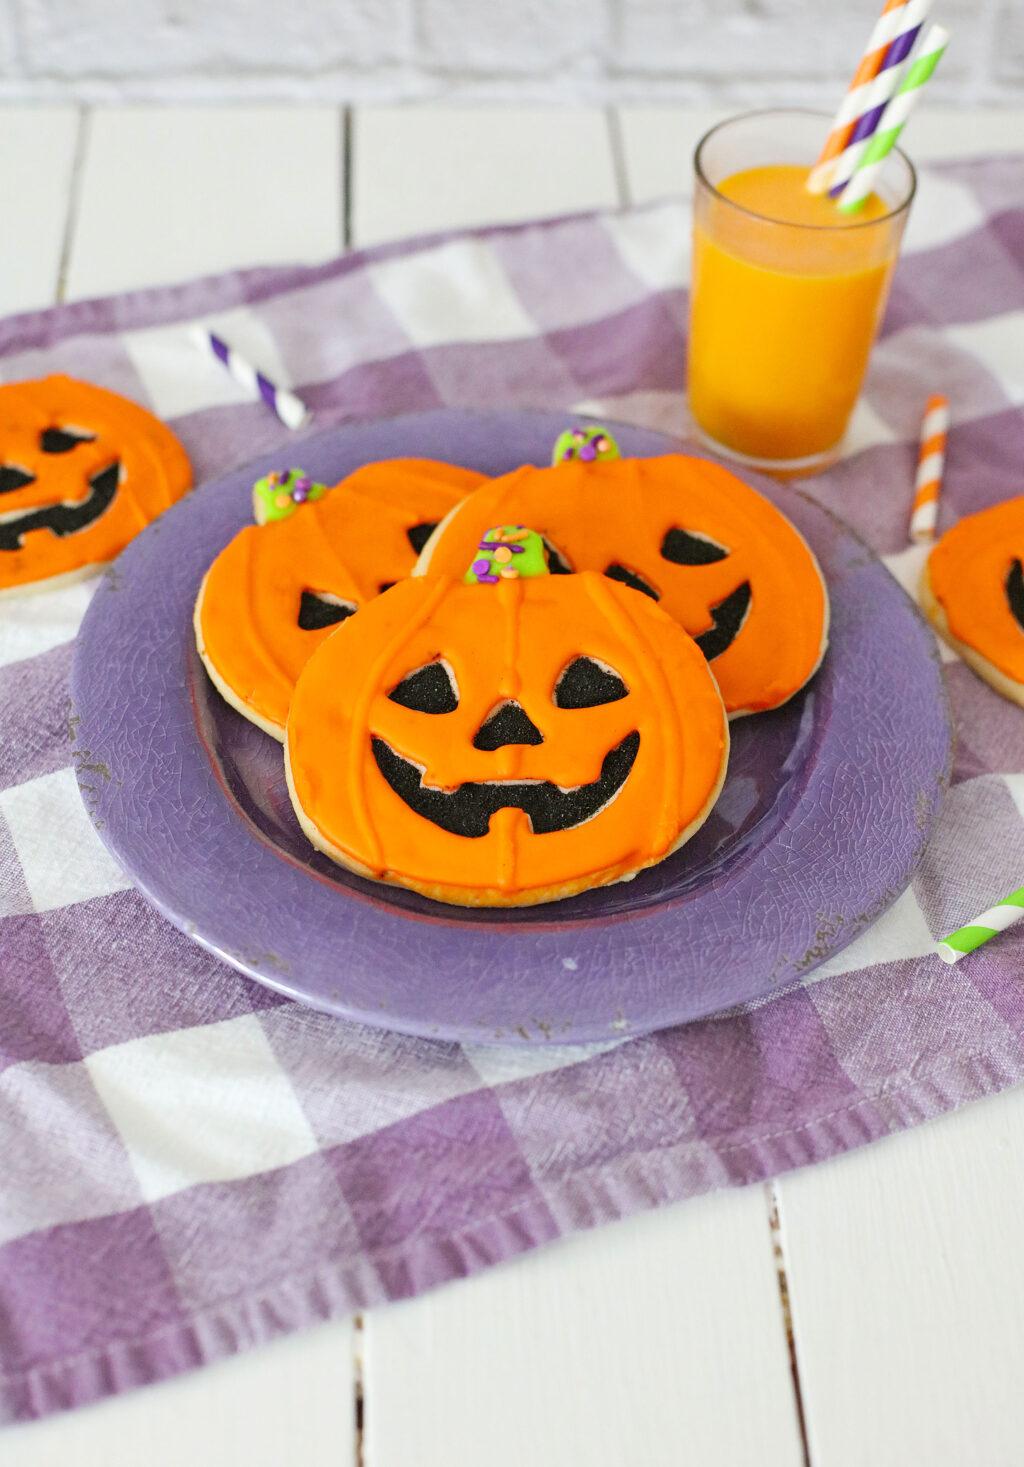 jack-o'-lantern cookies decorated to look like pumpkins on a purple plate